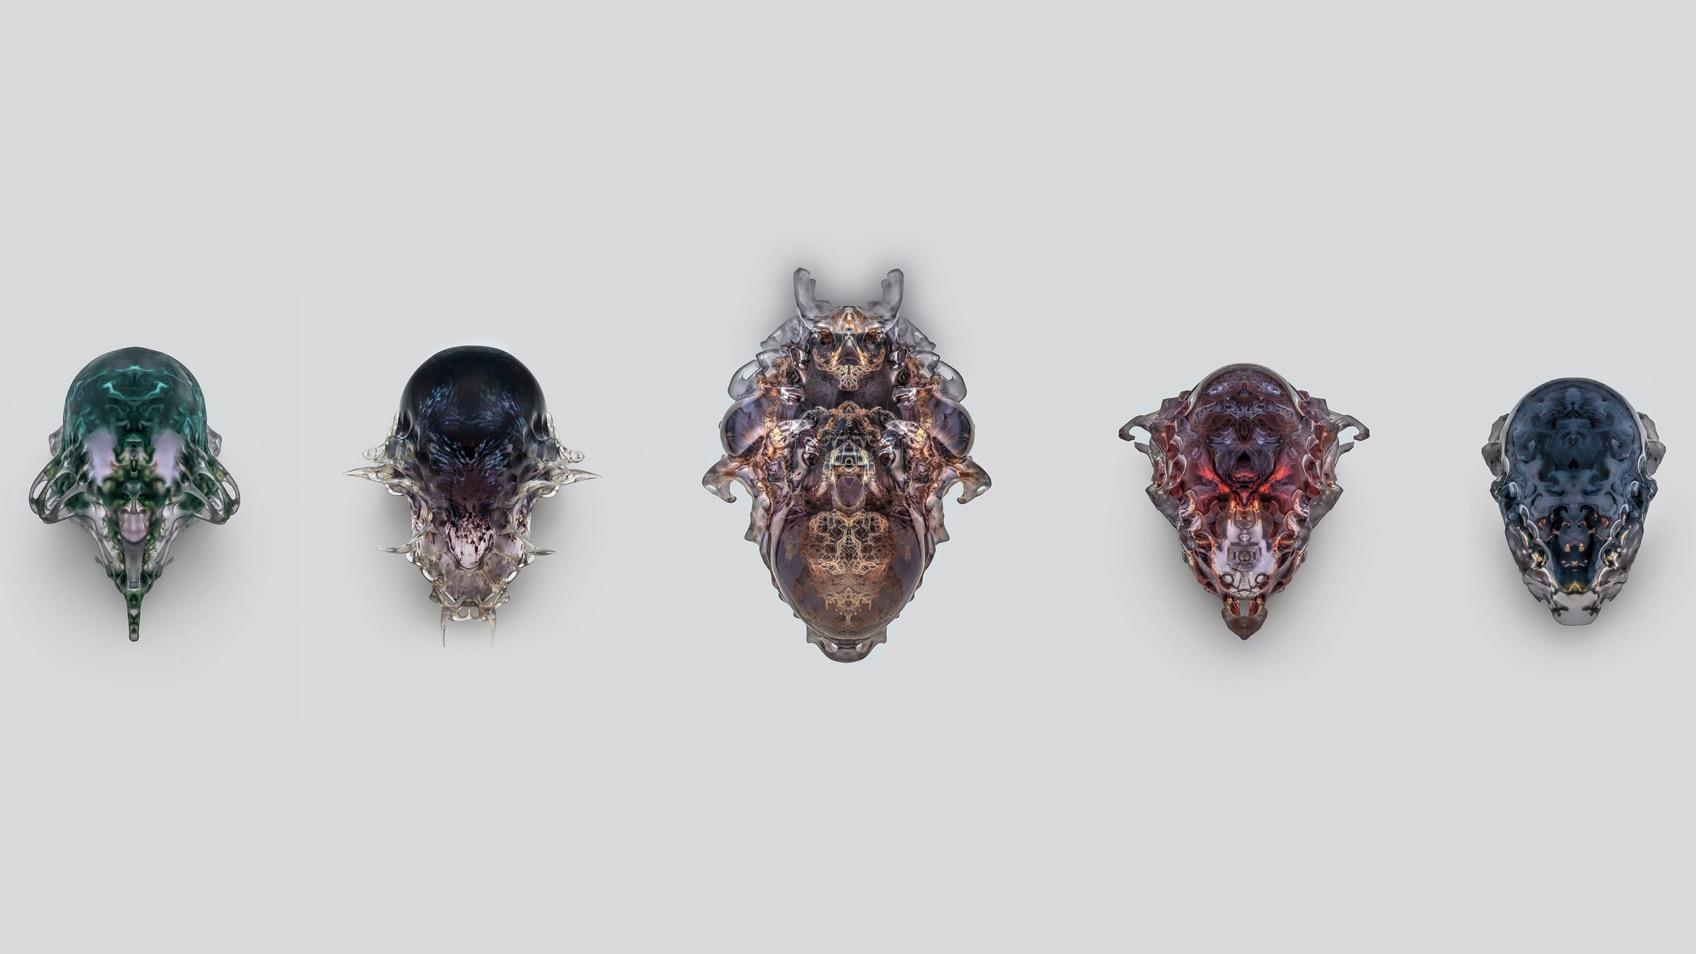 Vespers neri oxman 3d printed death masks mediated matter group dezeen hero